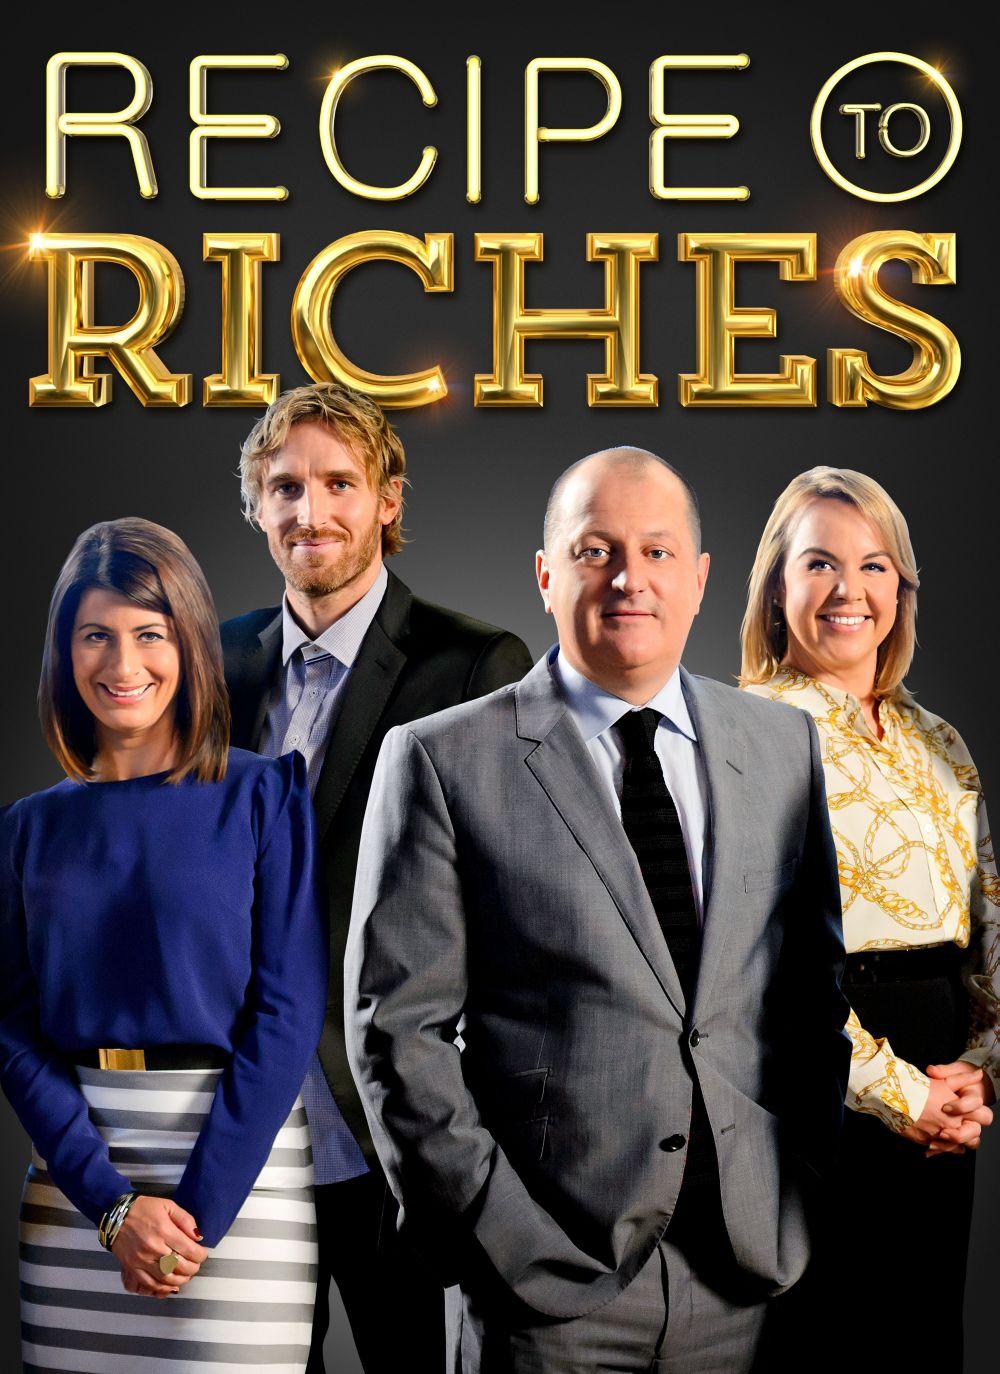 Recipe To Riches: Season 2